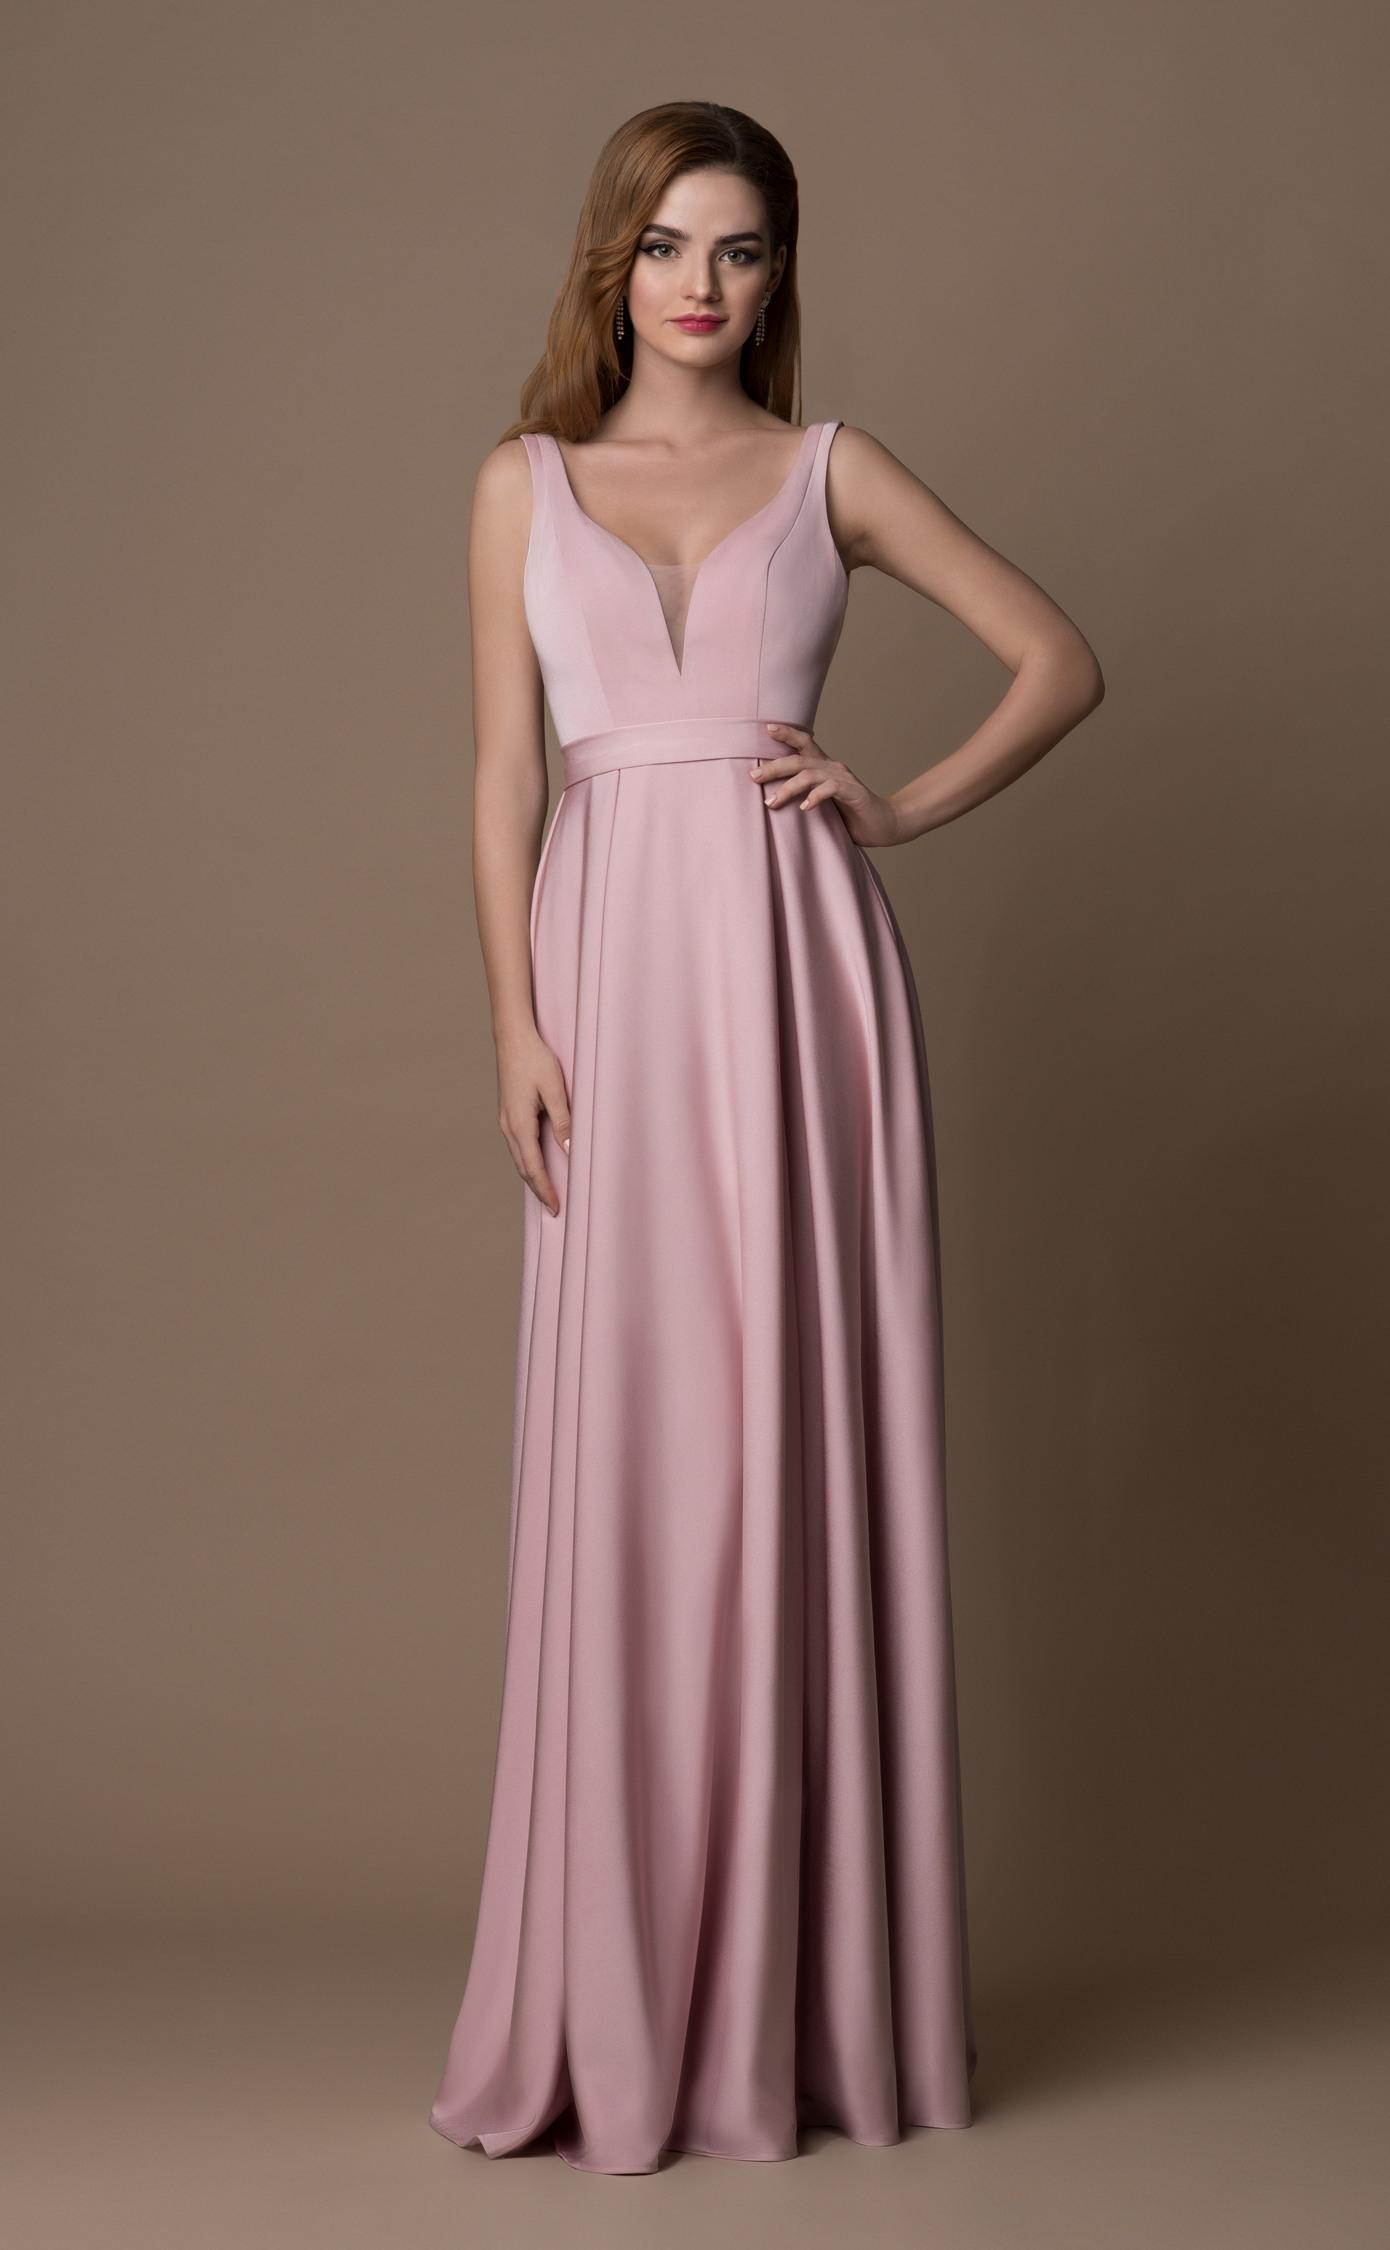 Formal Leicht Altrosa Abendkleid Bester Preis15 Coolste Altrosa Abendkleid Spezialgebiet